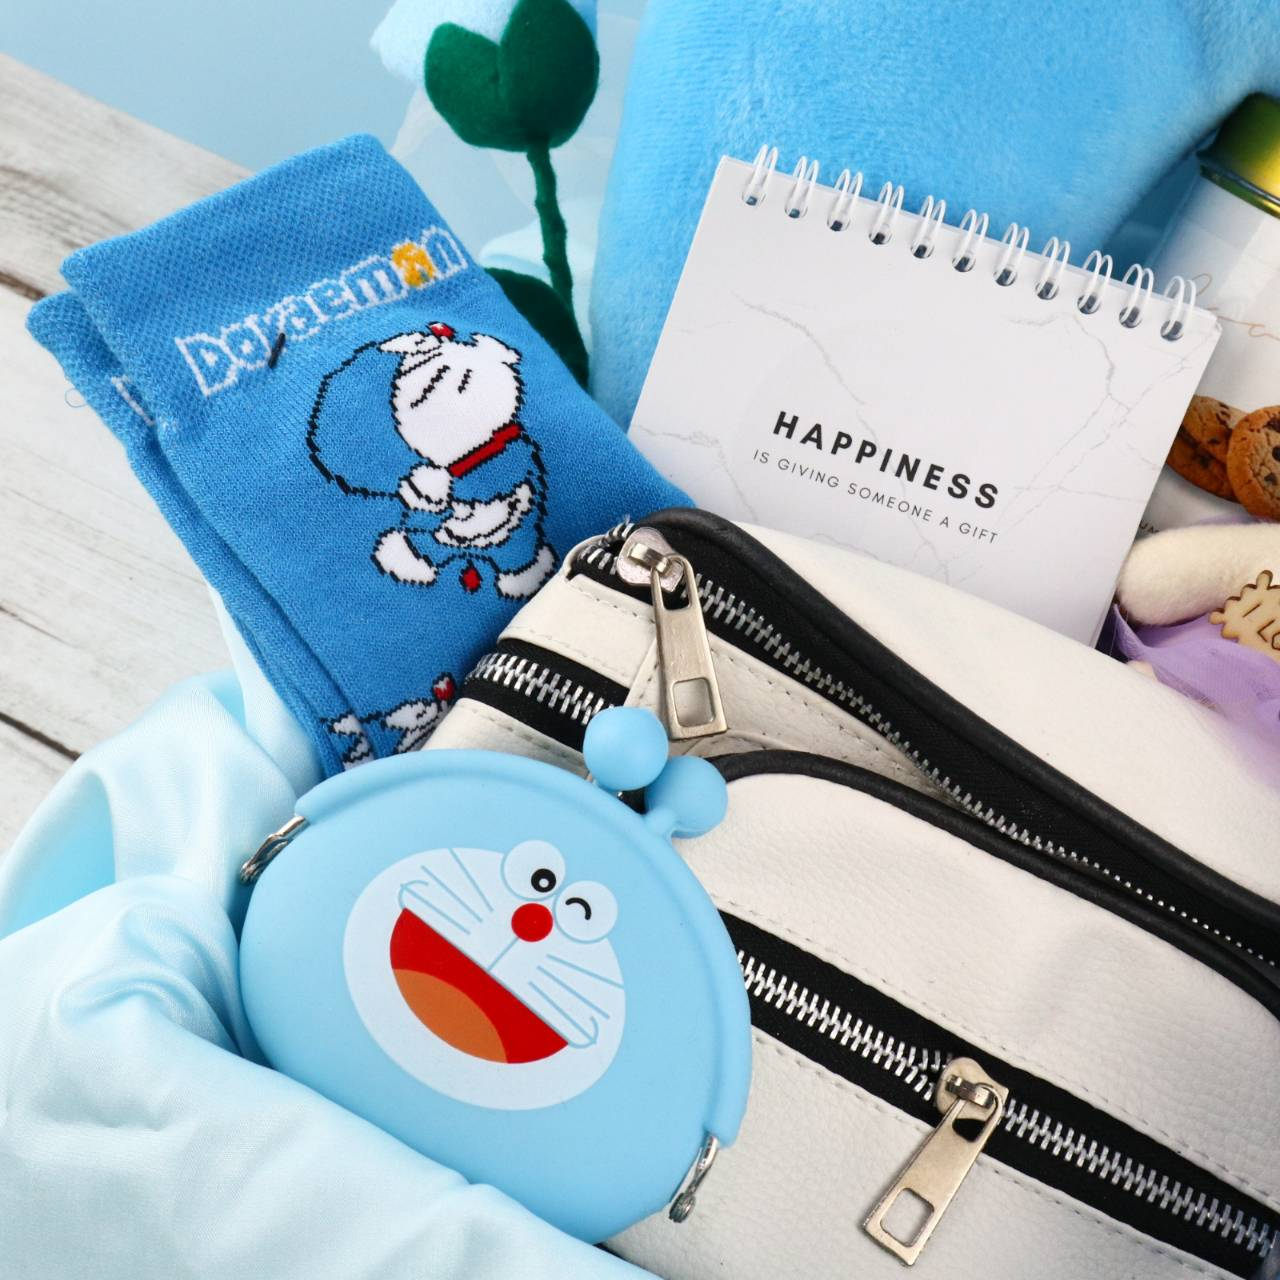 Kadobox Traveller Paket Kado Wanita Limited Edition Doraemon 2